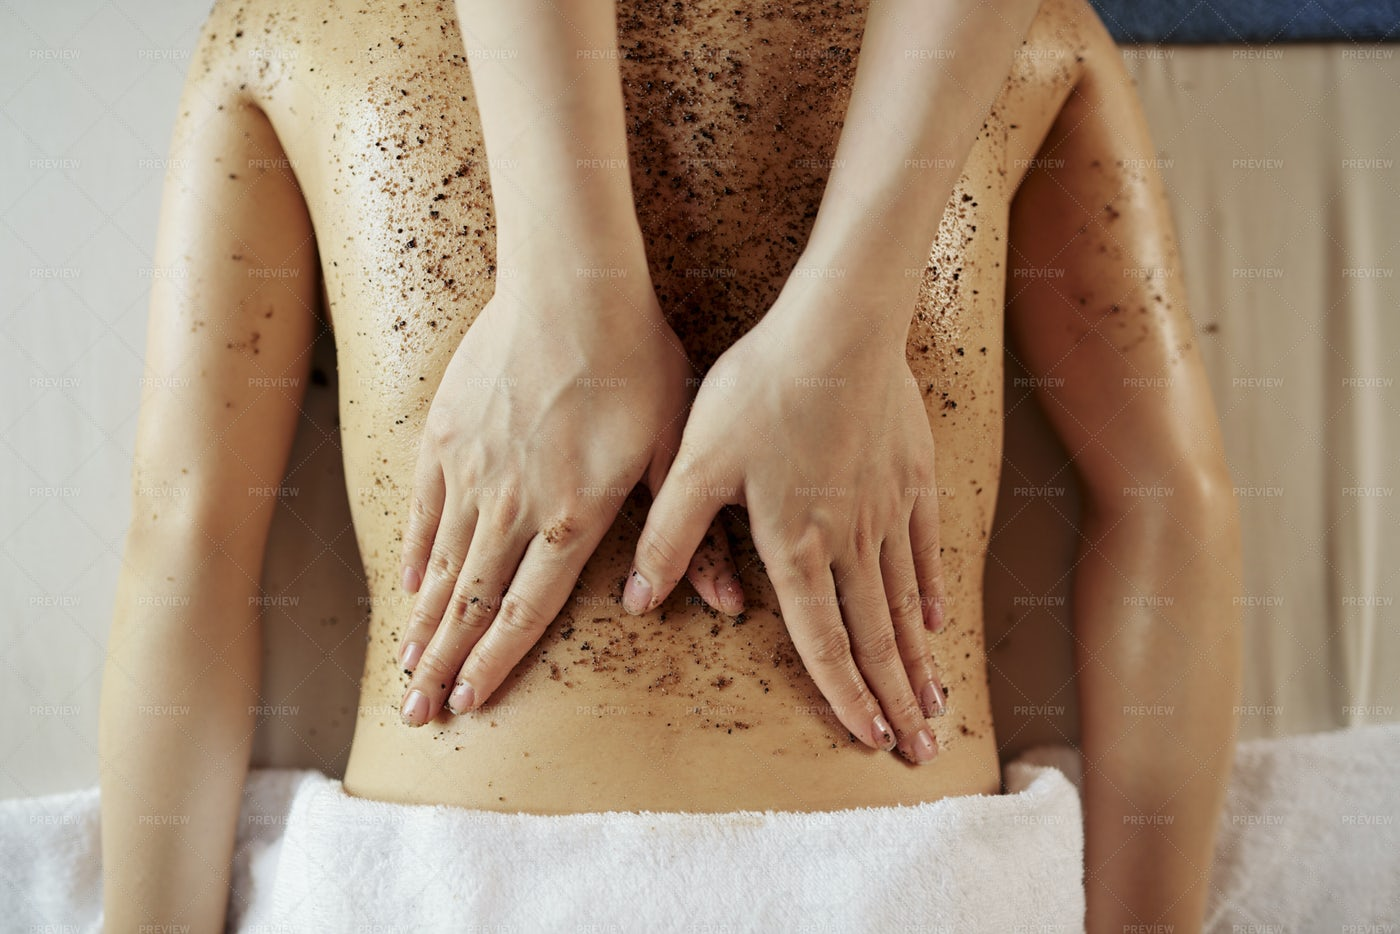 Beautician Applying Body Scrub: Stock Photos